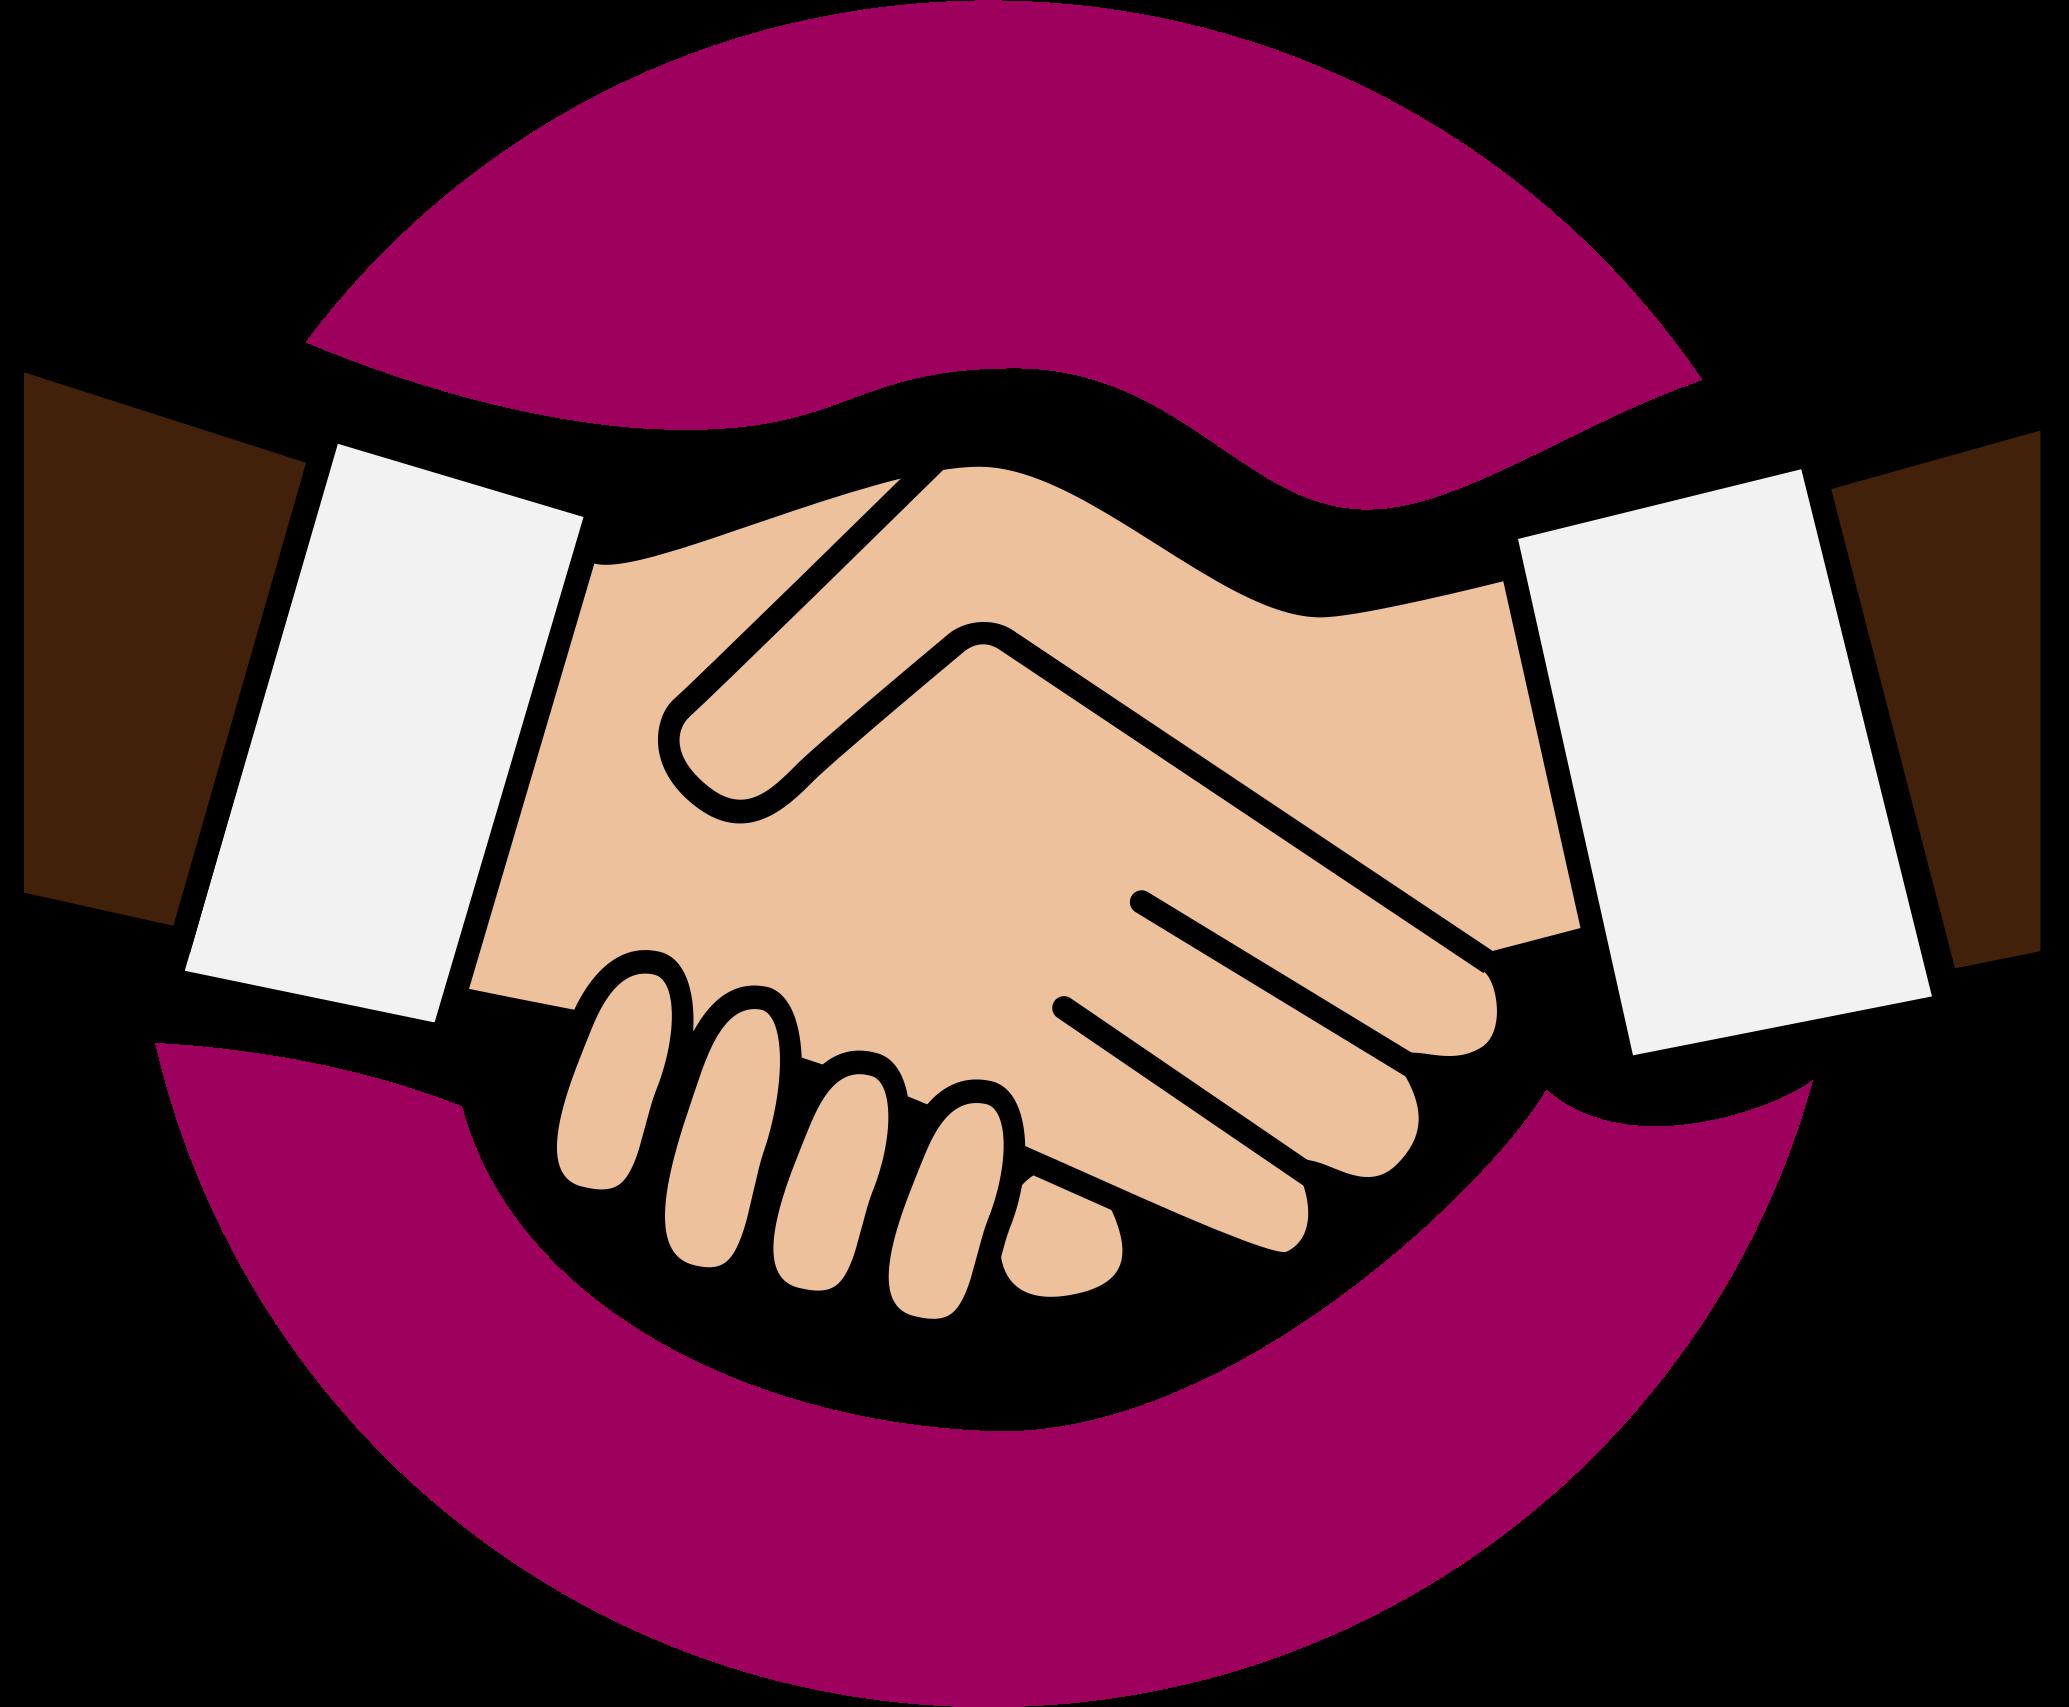 A handshake icon big. Hand clipart friend